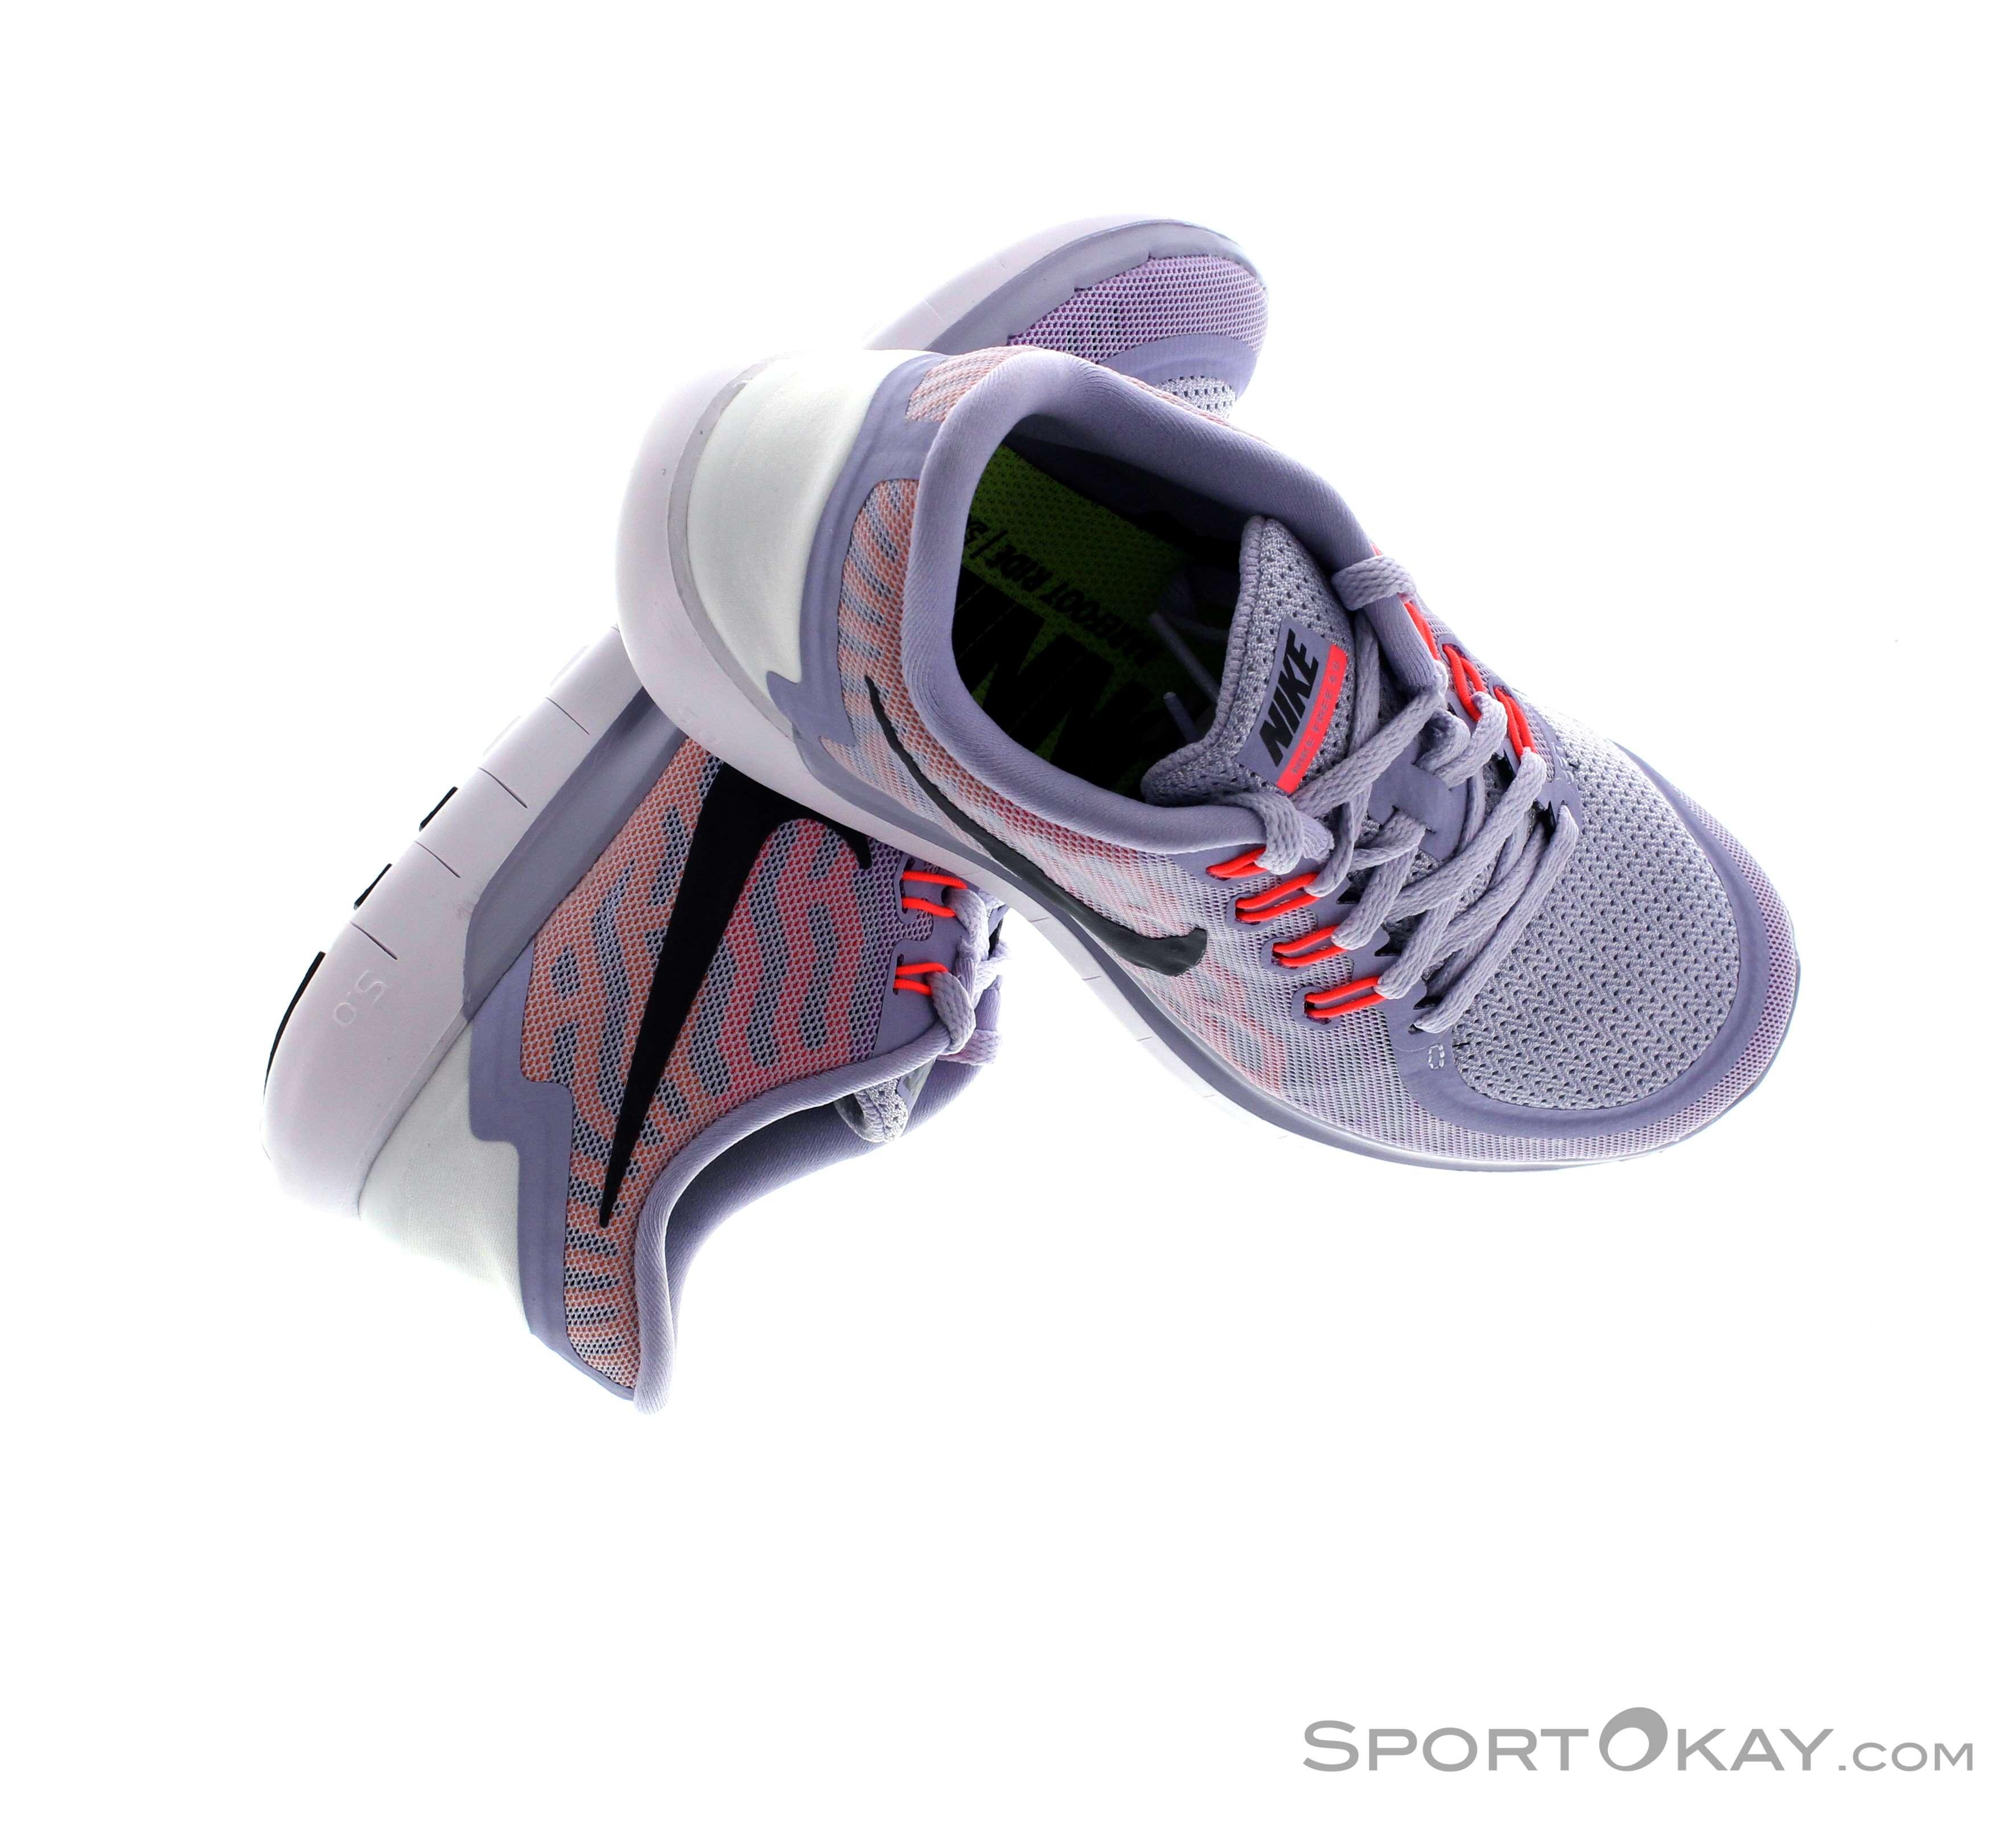 competitive price d0bb1 45603 Nike Free 5.0 Damen Laufschuhe, Nike, Weiss, , Damen, 0026-10228